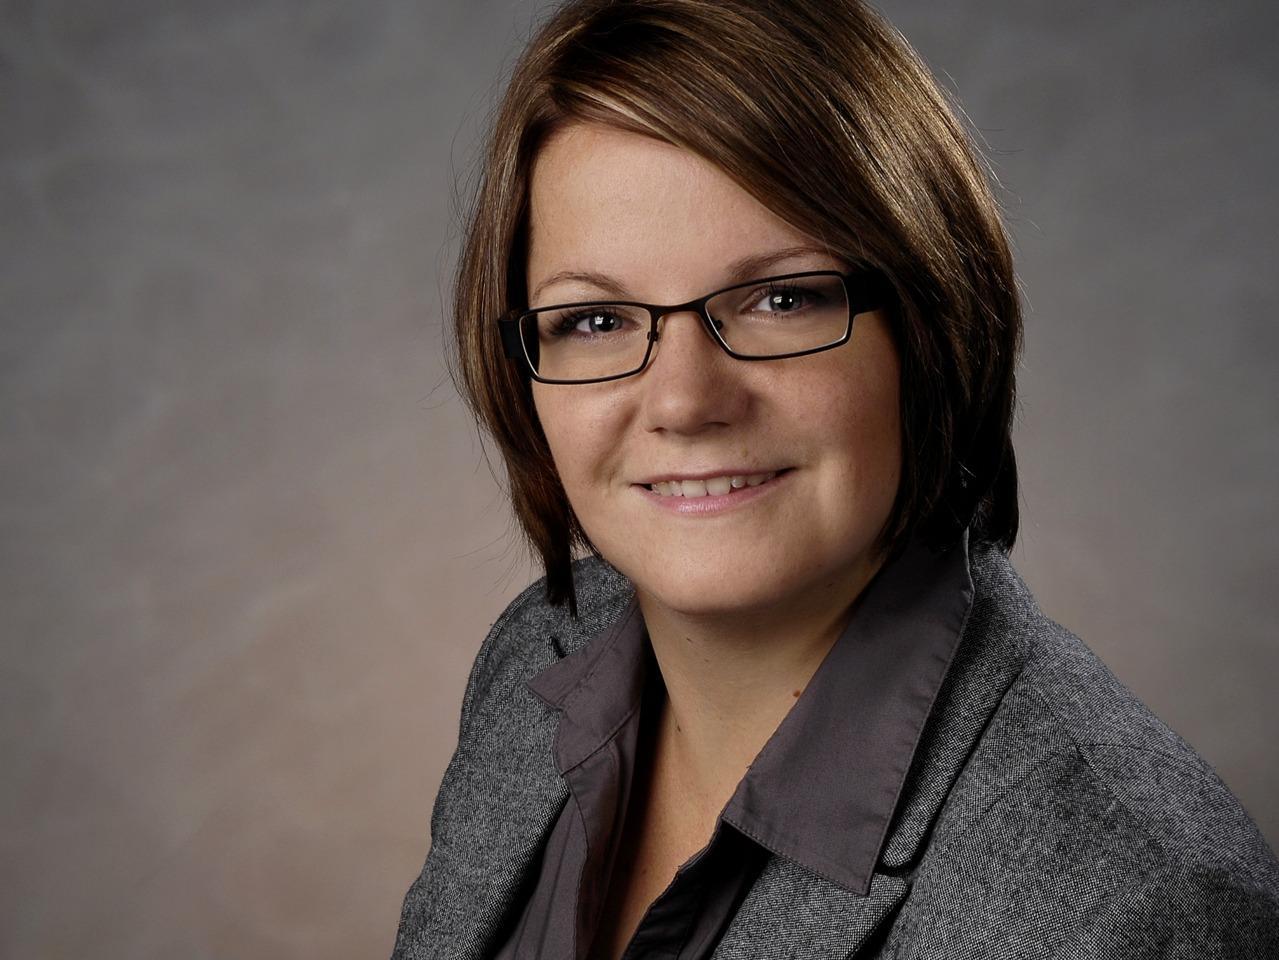 Marleen Mützlaff wird neue Kulturchefin